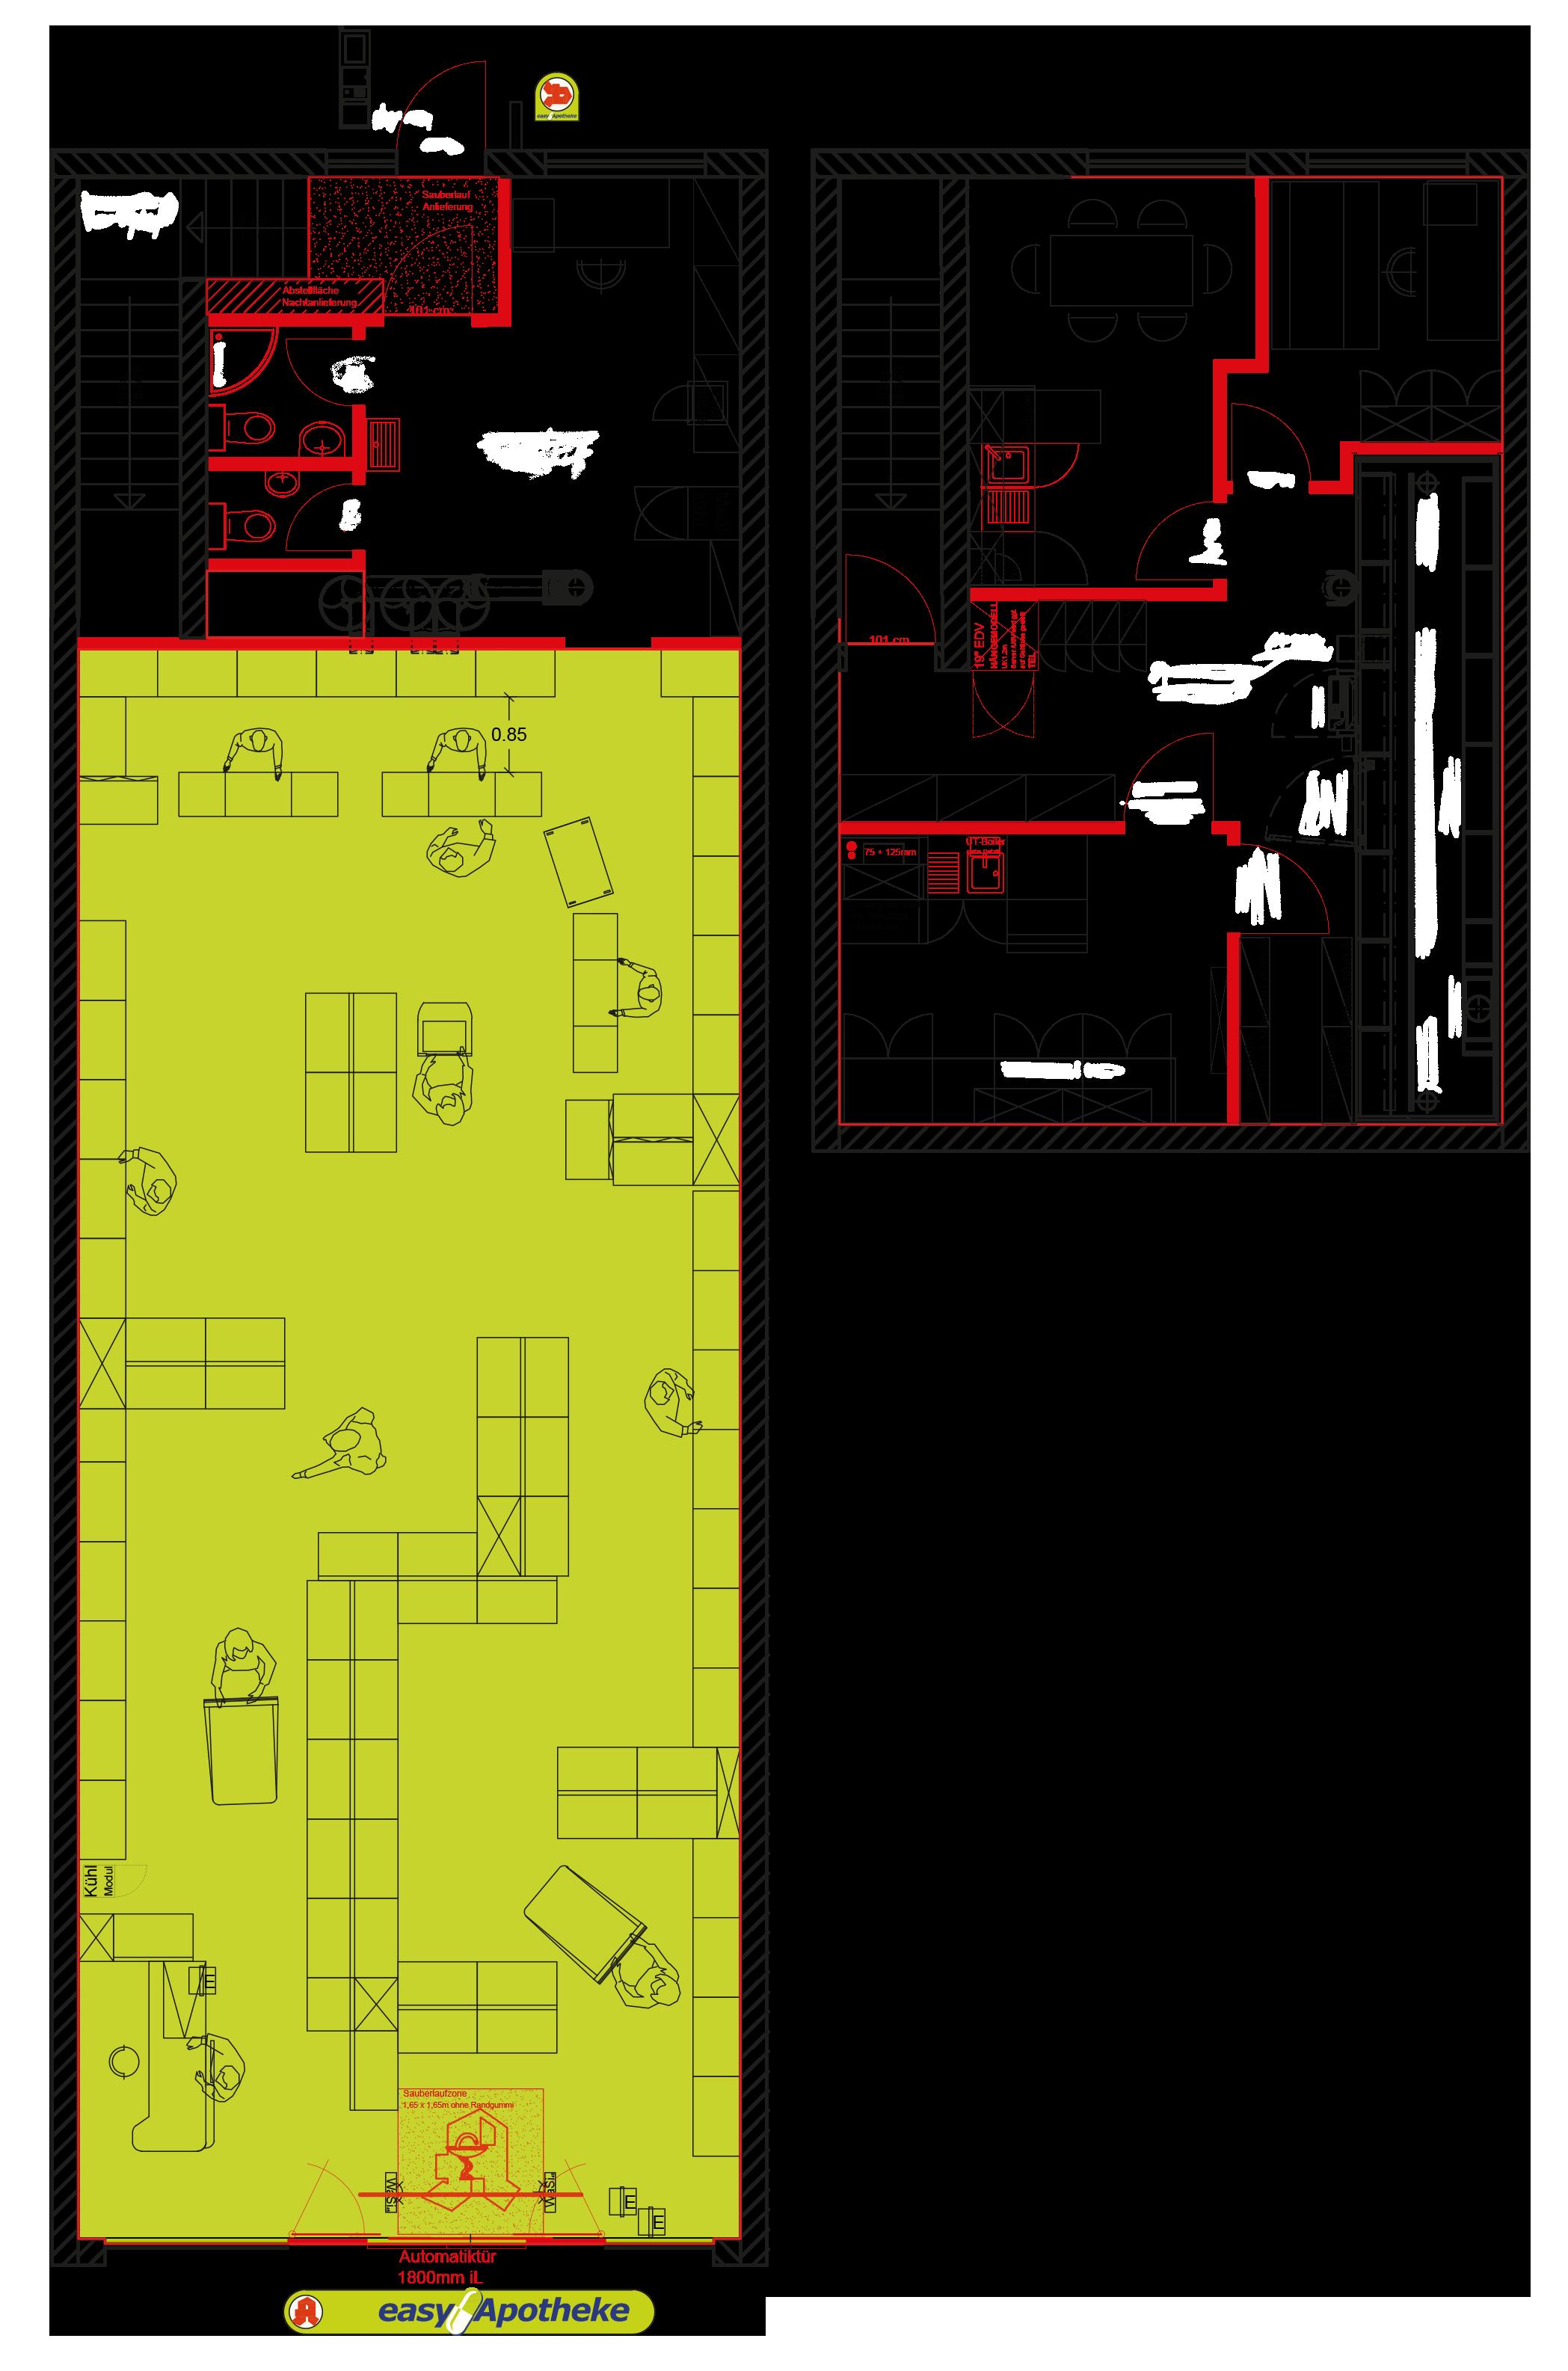 easyApotheke - Standort anbieten - Bahnhöfe und Flughäfen - Mustergrundriss